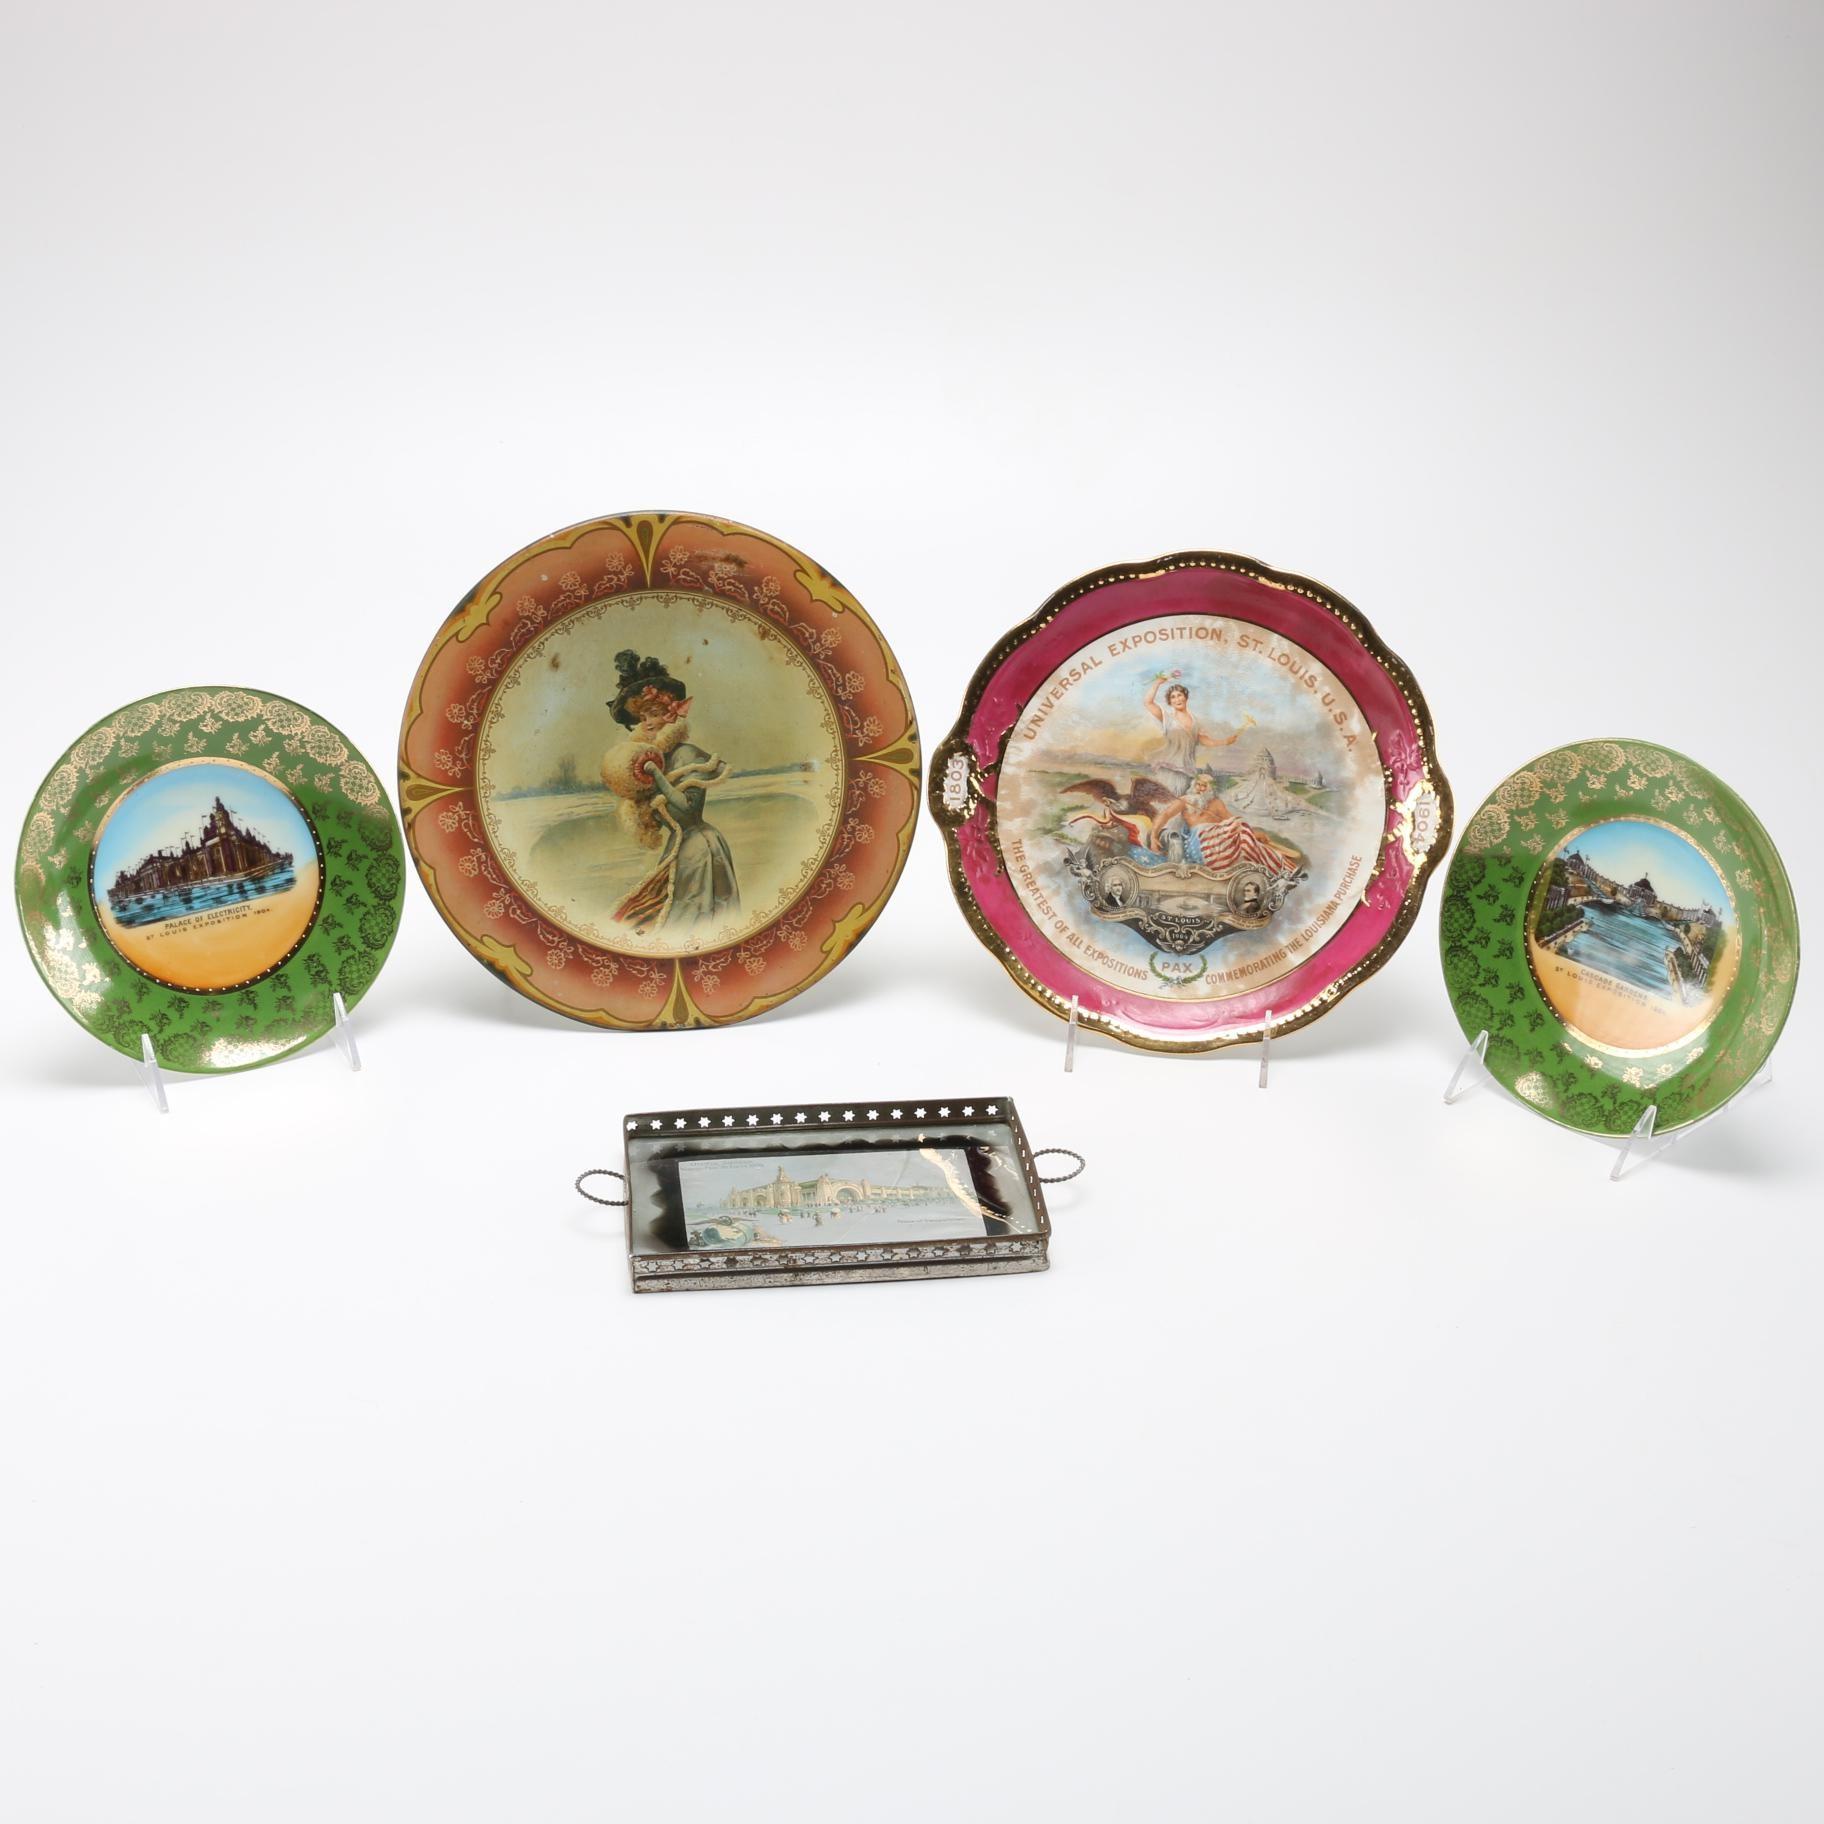 1904 St. Louis World's Fair Commemorative Dishes